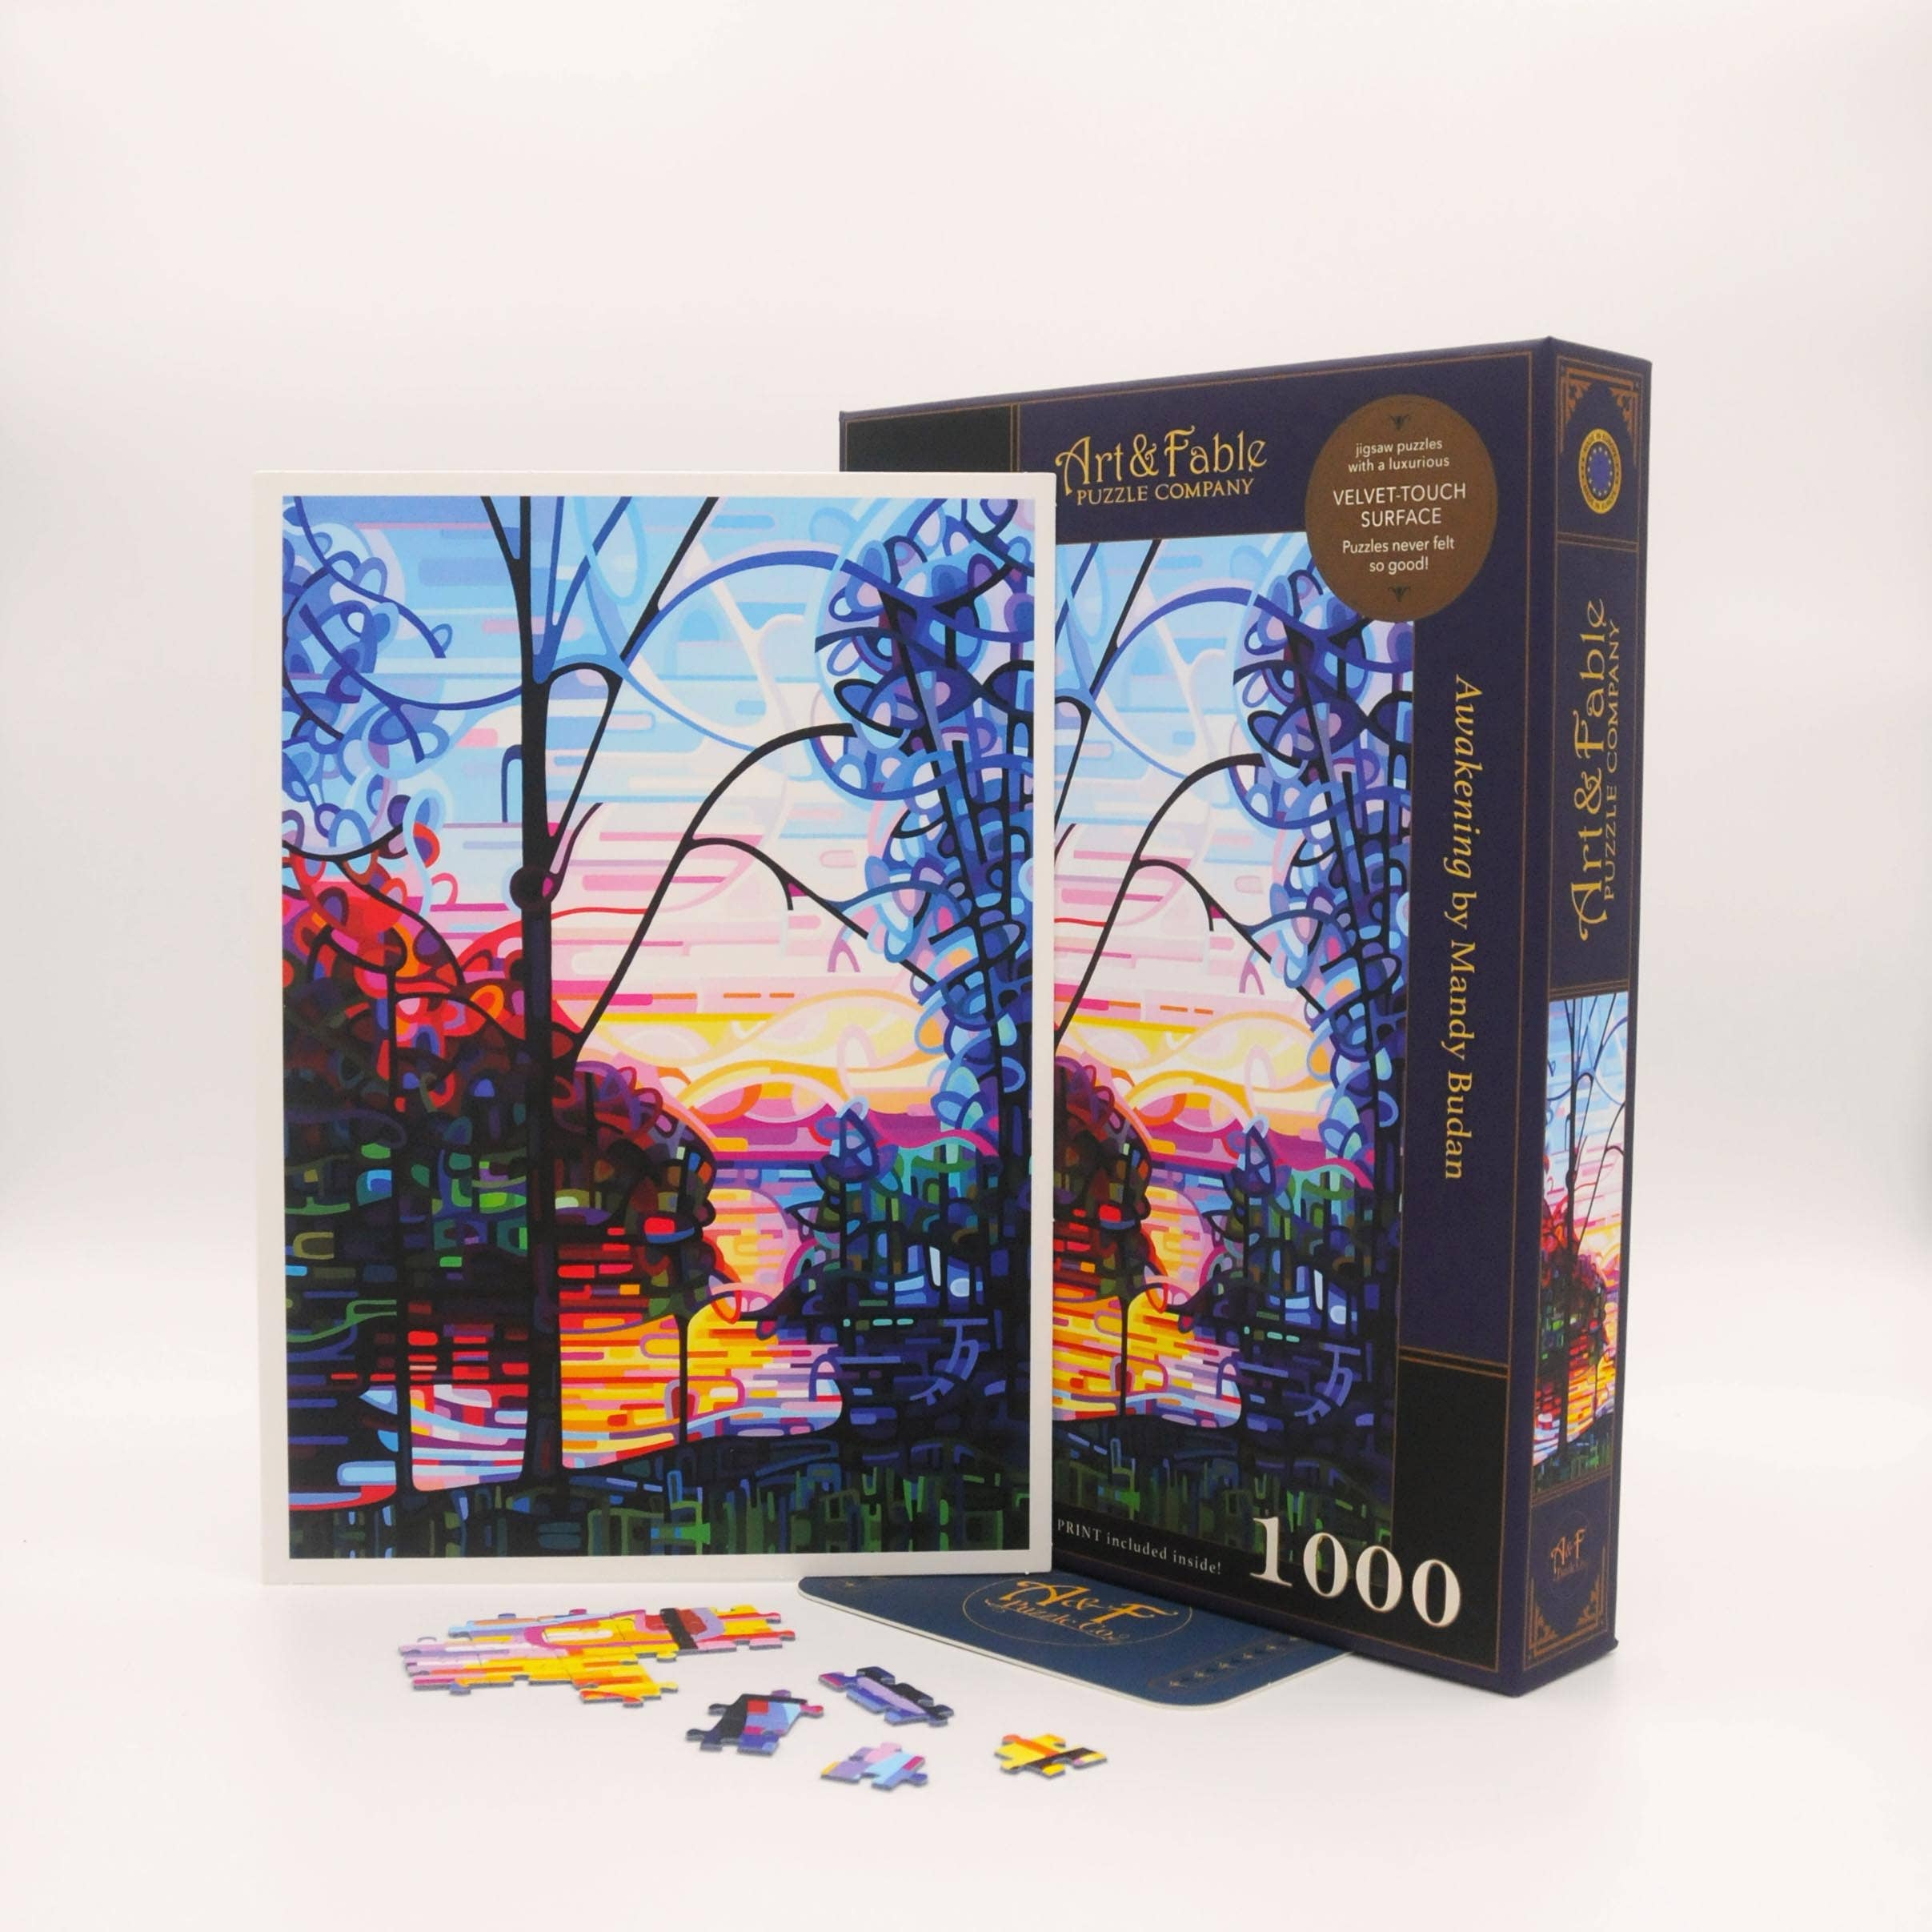 Awakening, 1000-pc Velvet-Touch Puzzle featuring the art of Mandy Budan | Trada Marketplace